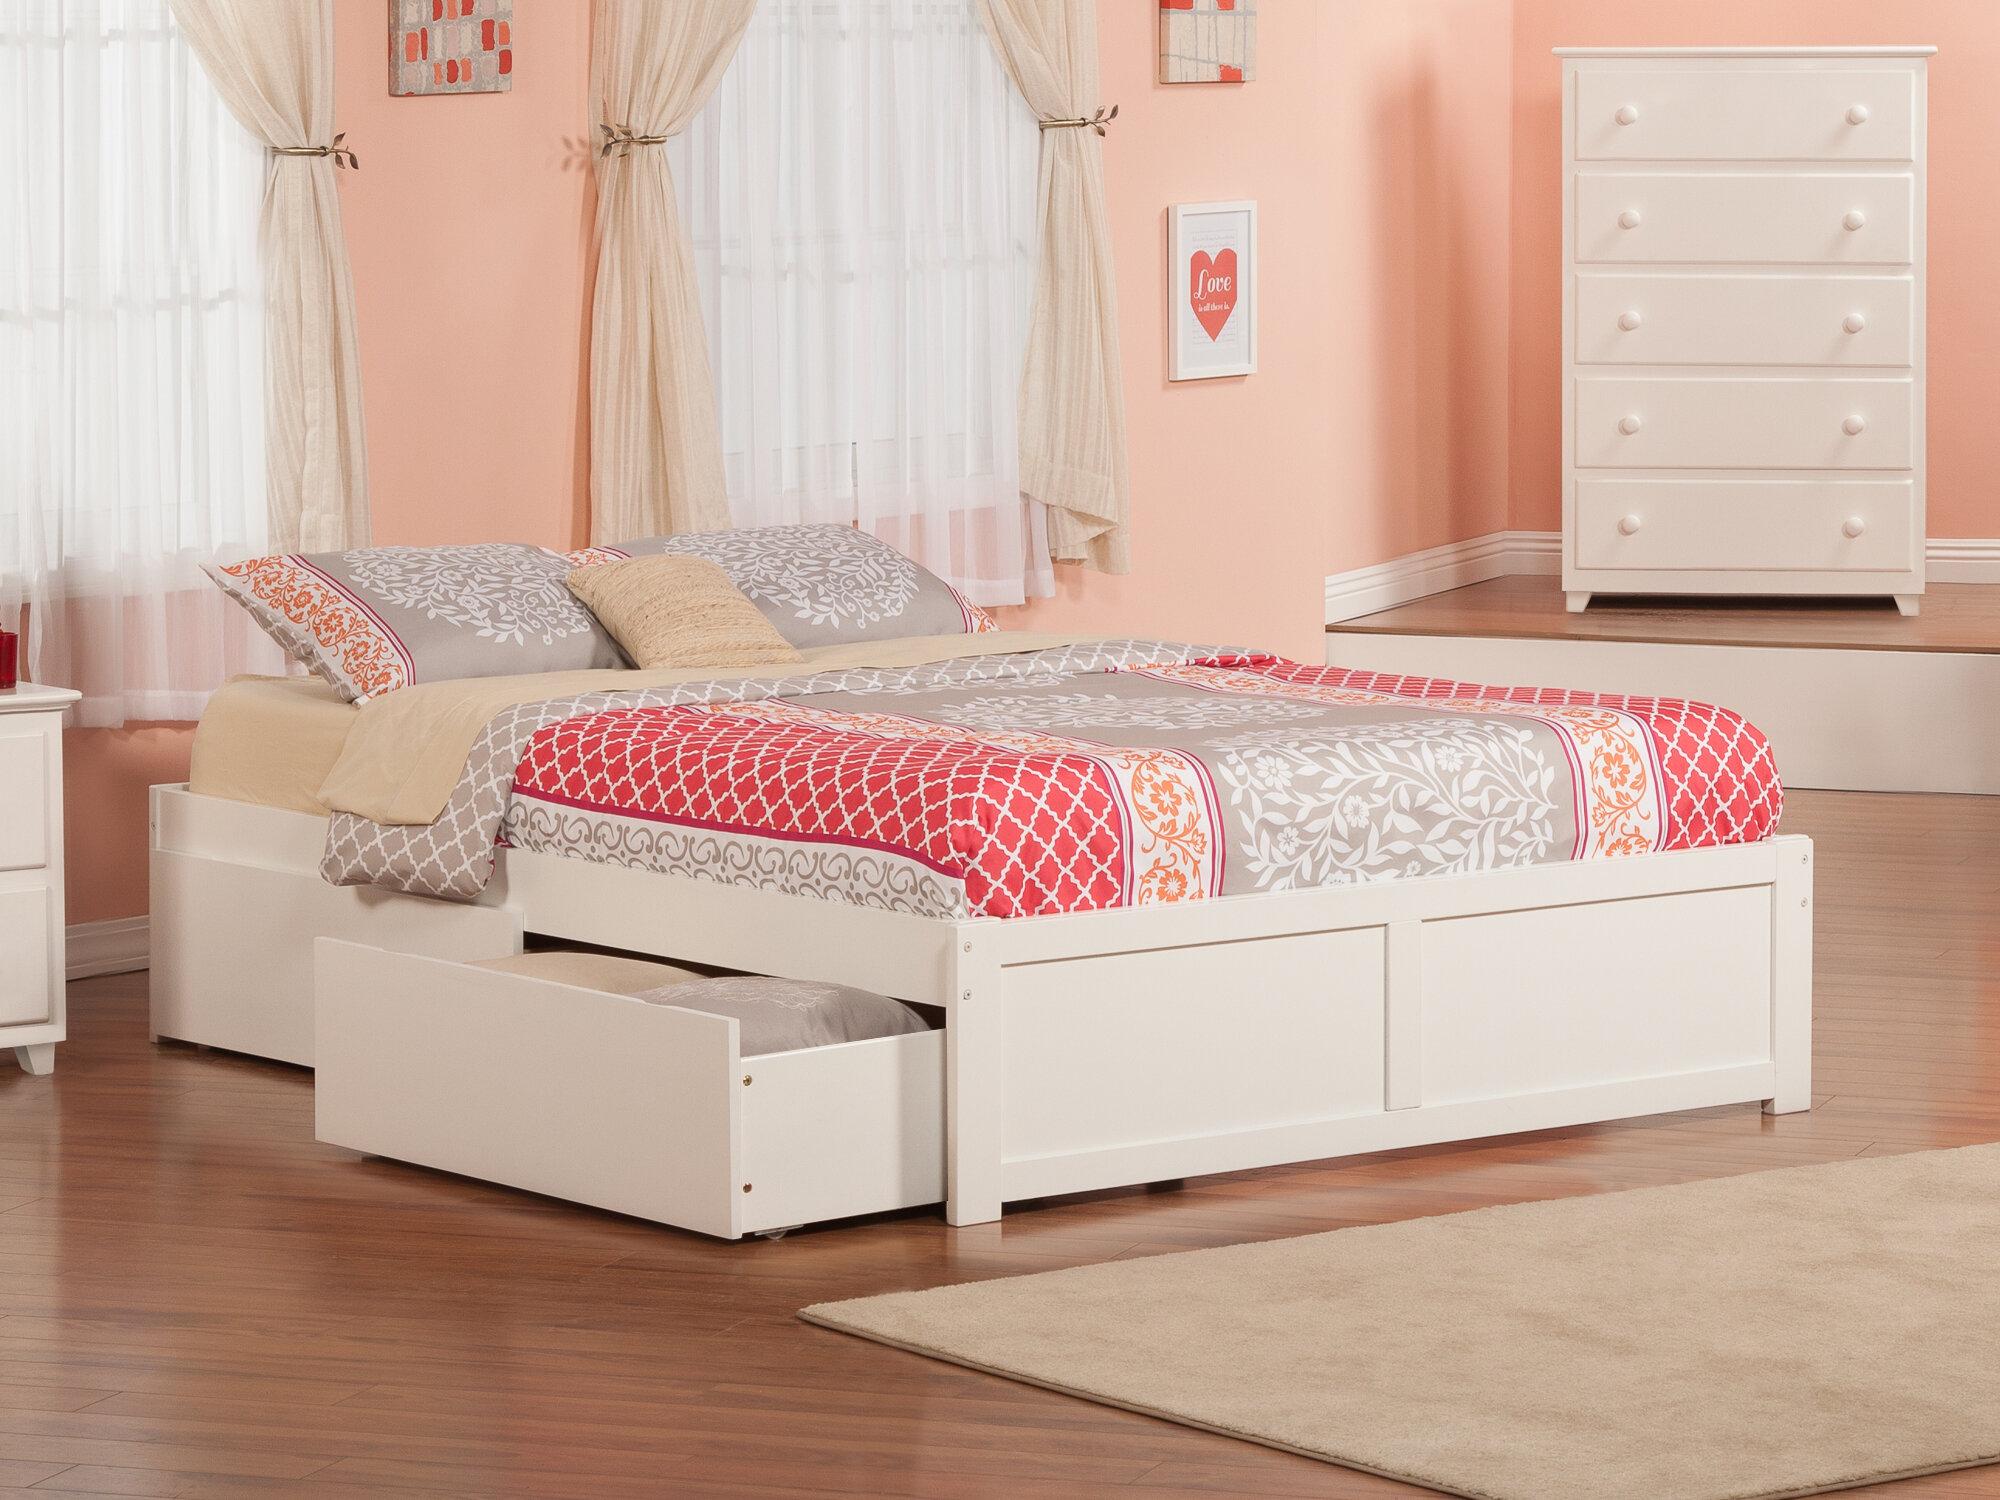 Beachcrest home alayah queen storage platform bed reviews wayfair ca